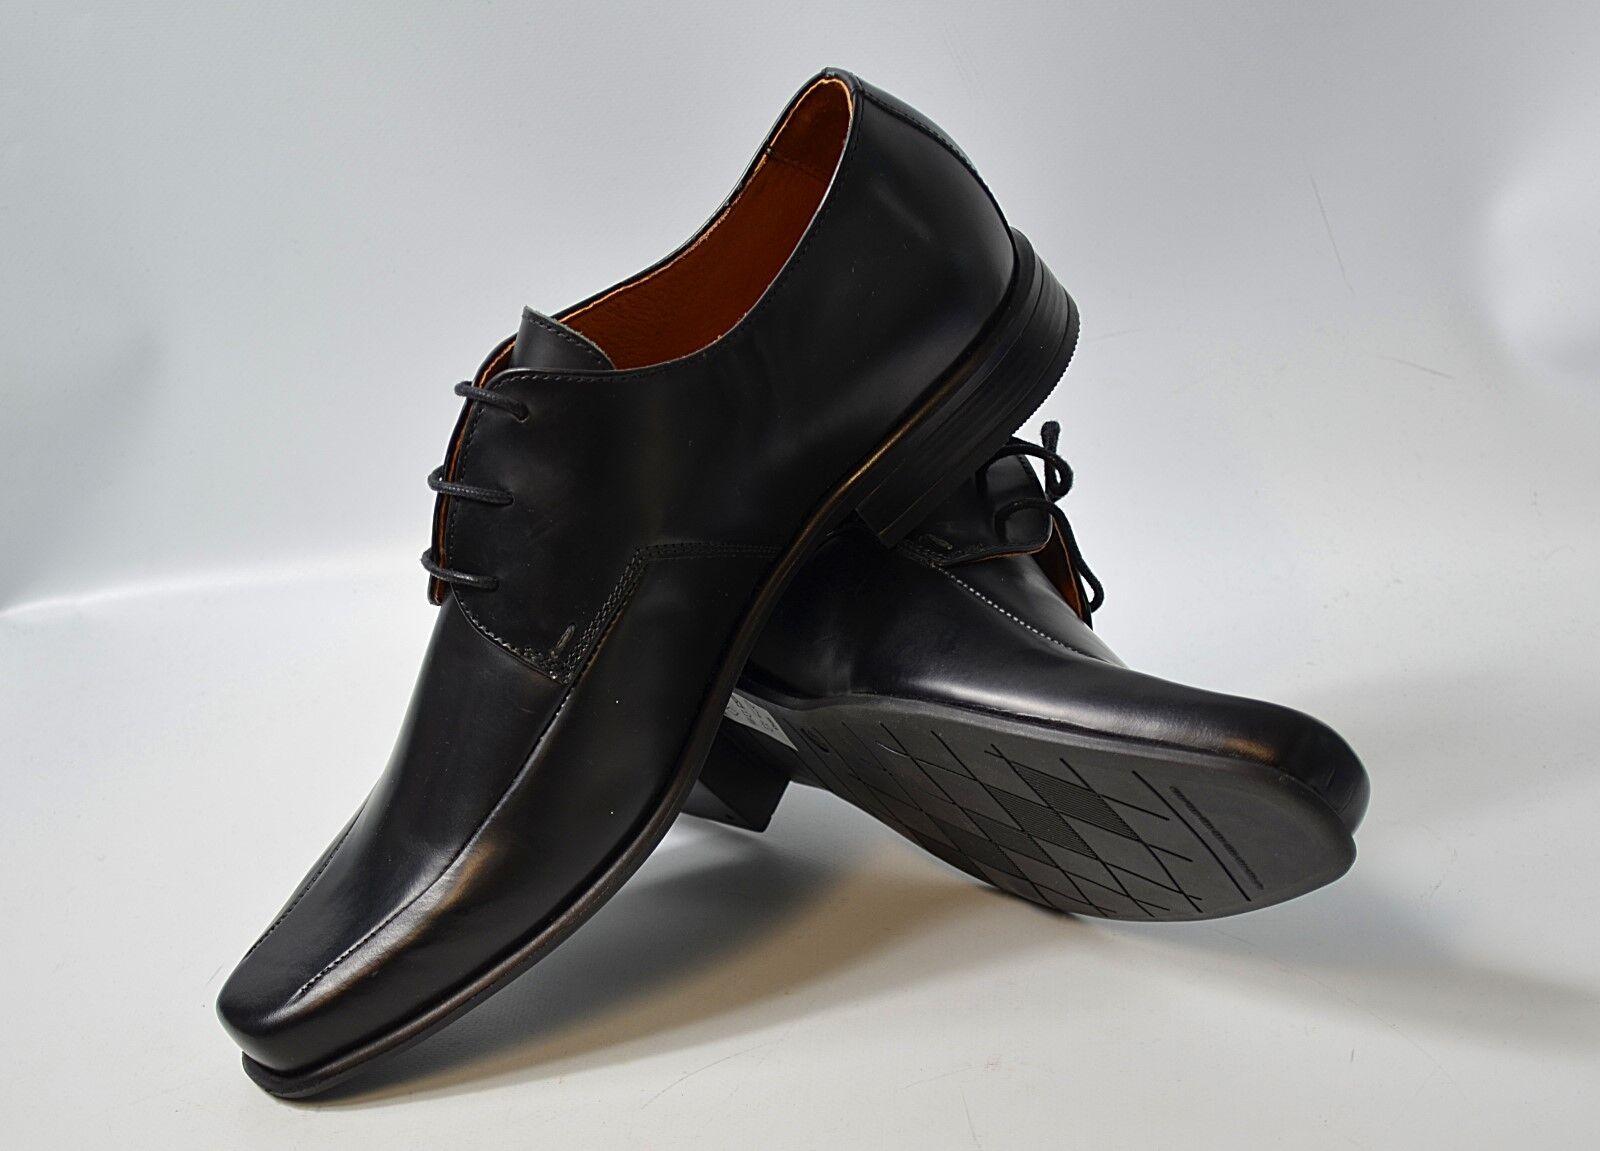 San Marina scarpe Pelle basse Massif MIS. 41 Pelle scarpe UVP  Scarpe da uomo (r4) 8/17 m2 5ffaa4